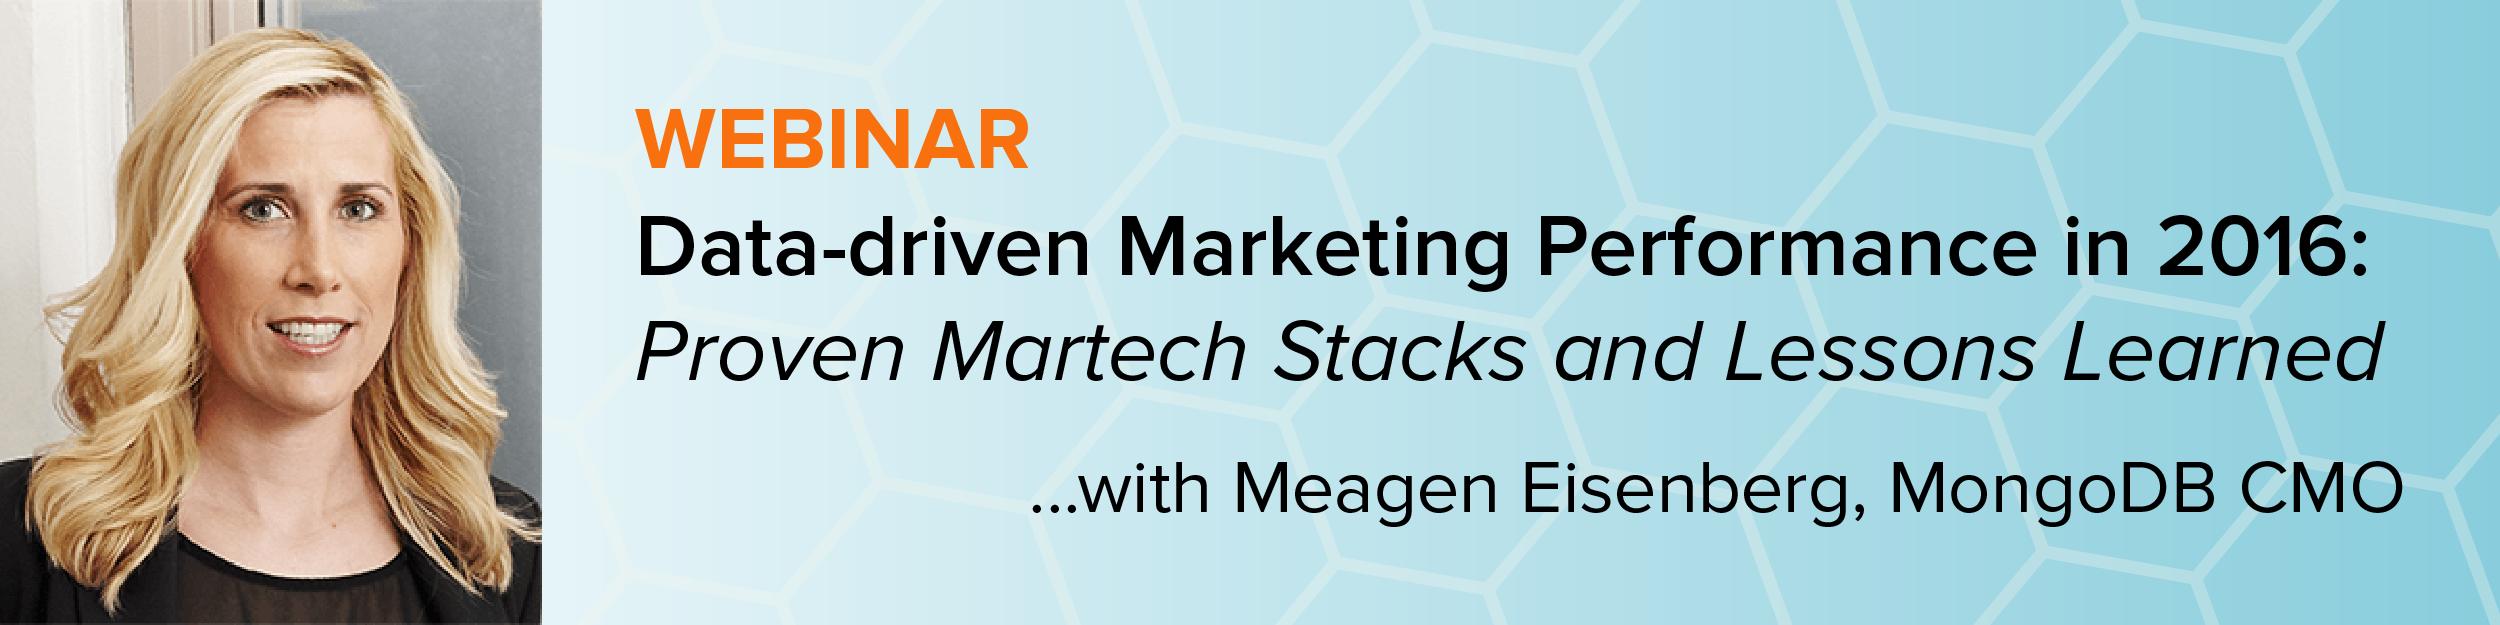 Data-Driven Marketing Technology